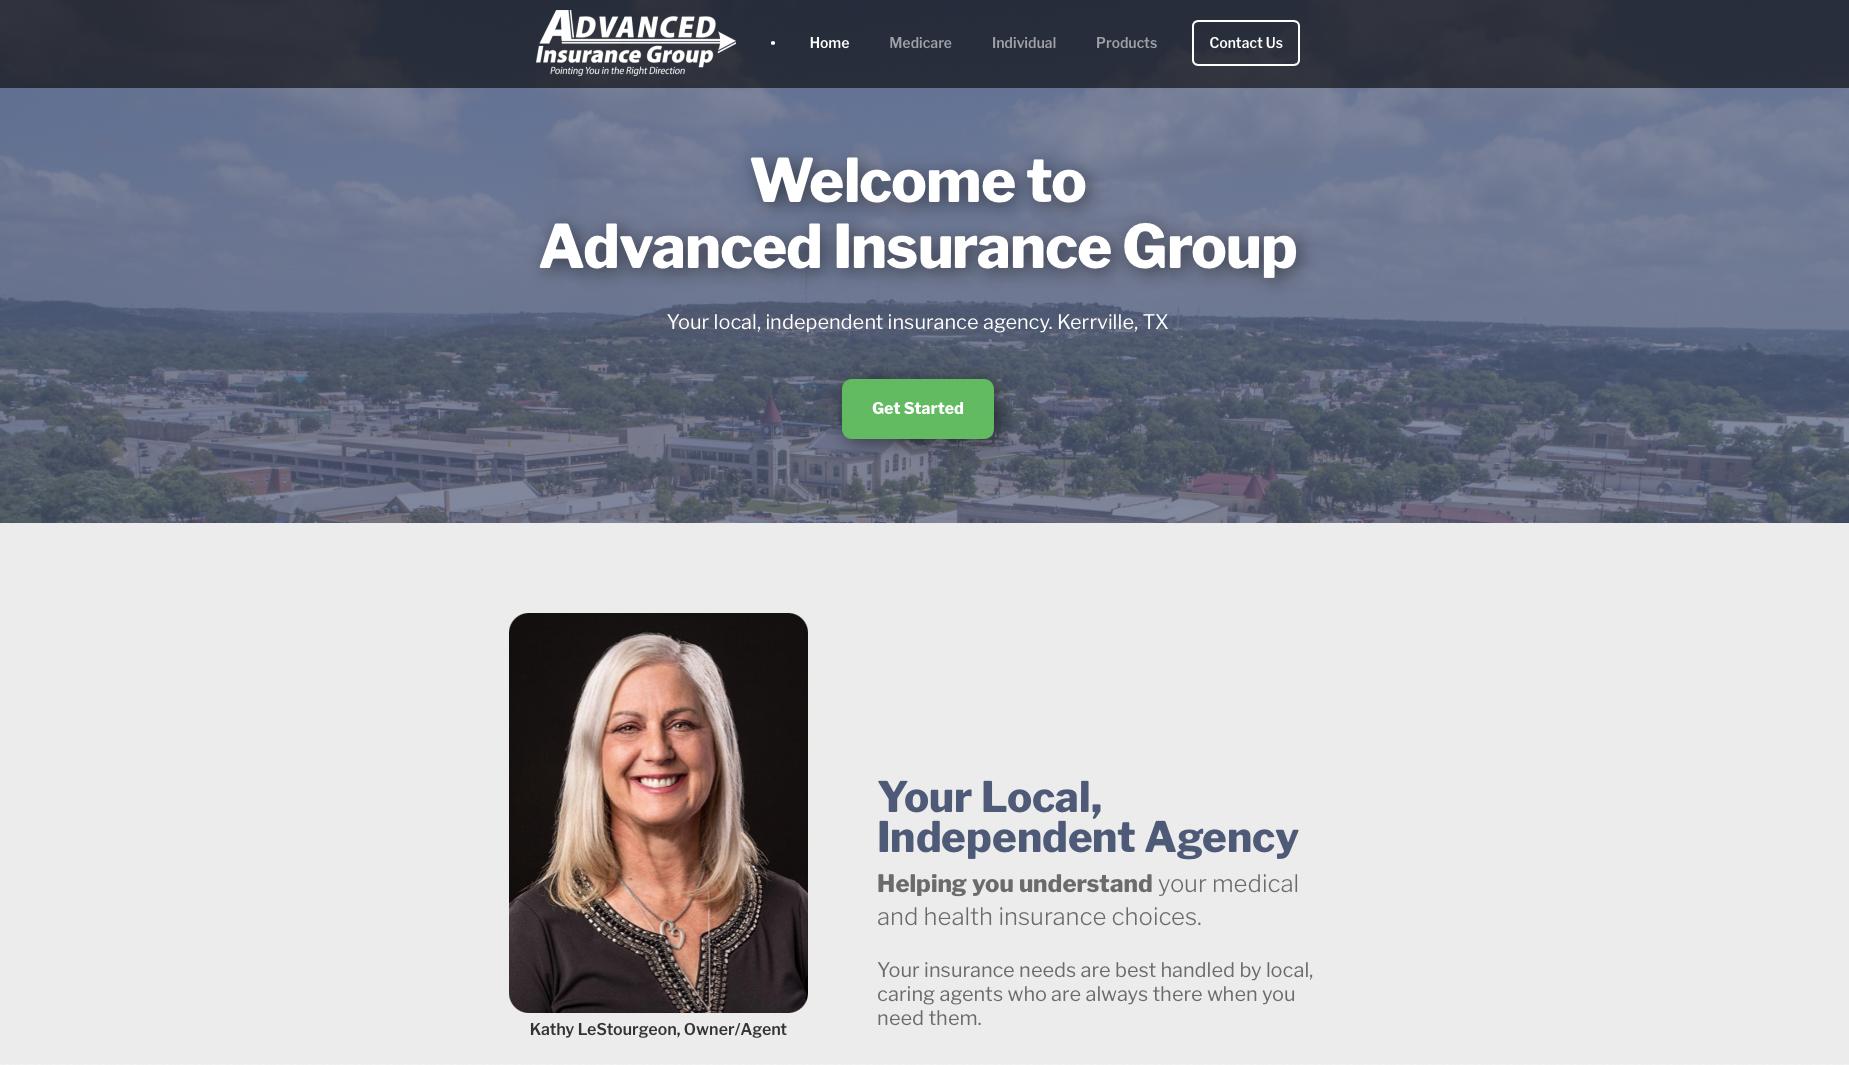 Advanced Insurance Group